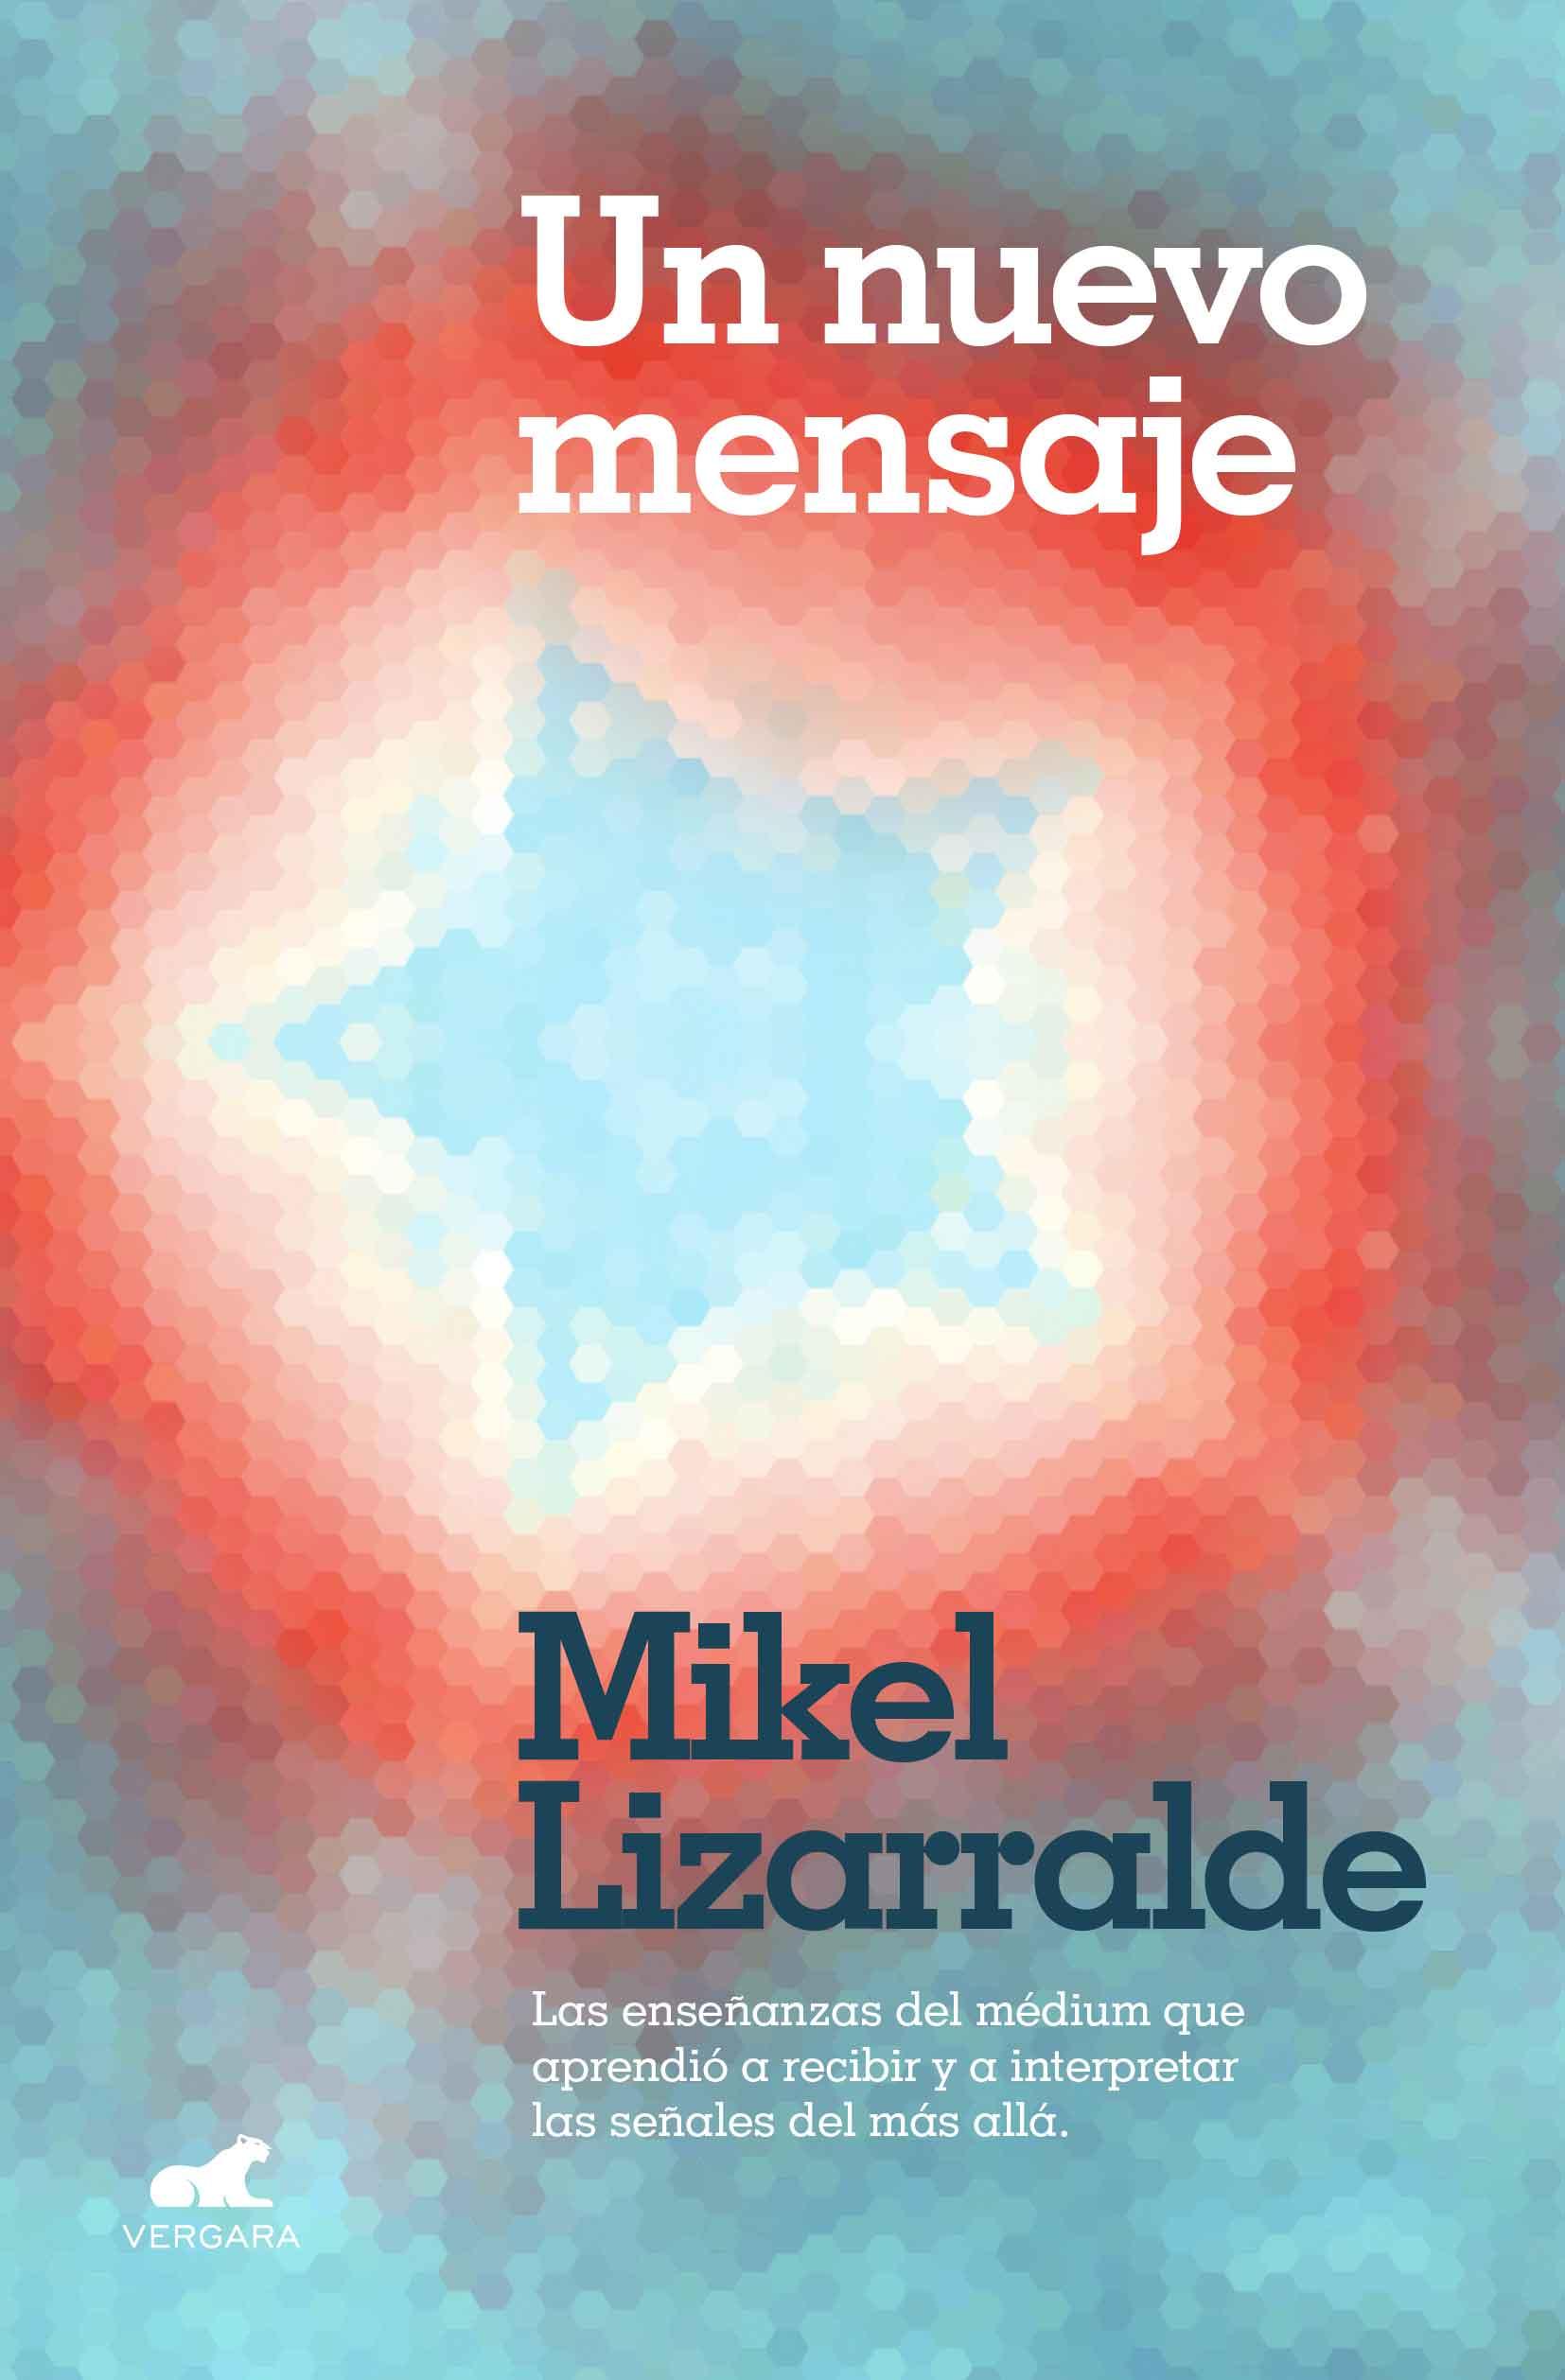 Mikel Lizarralde Buch